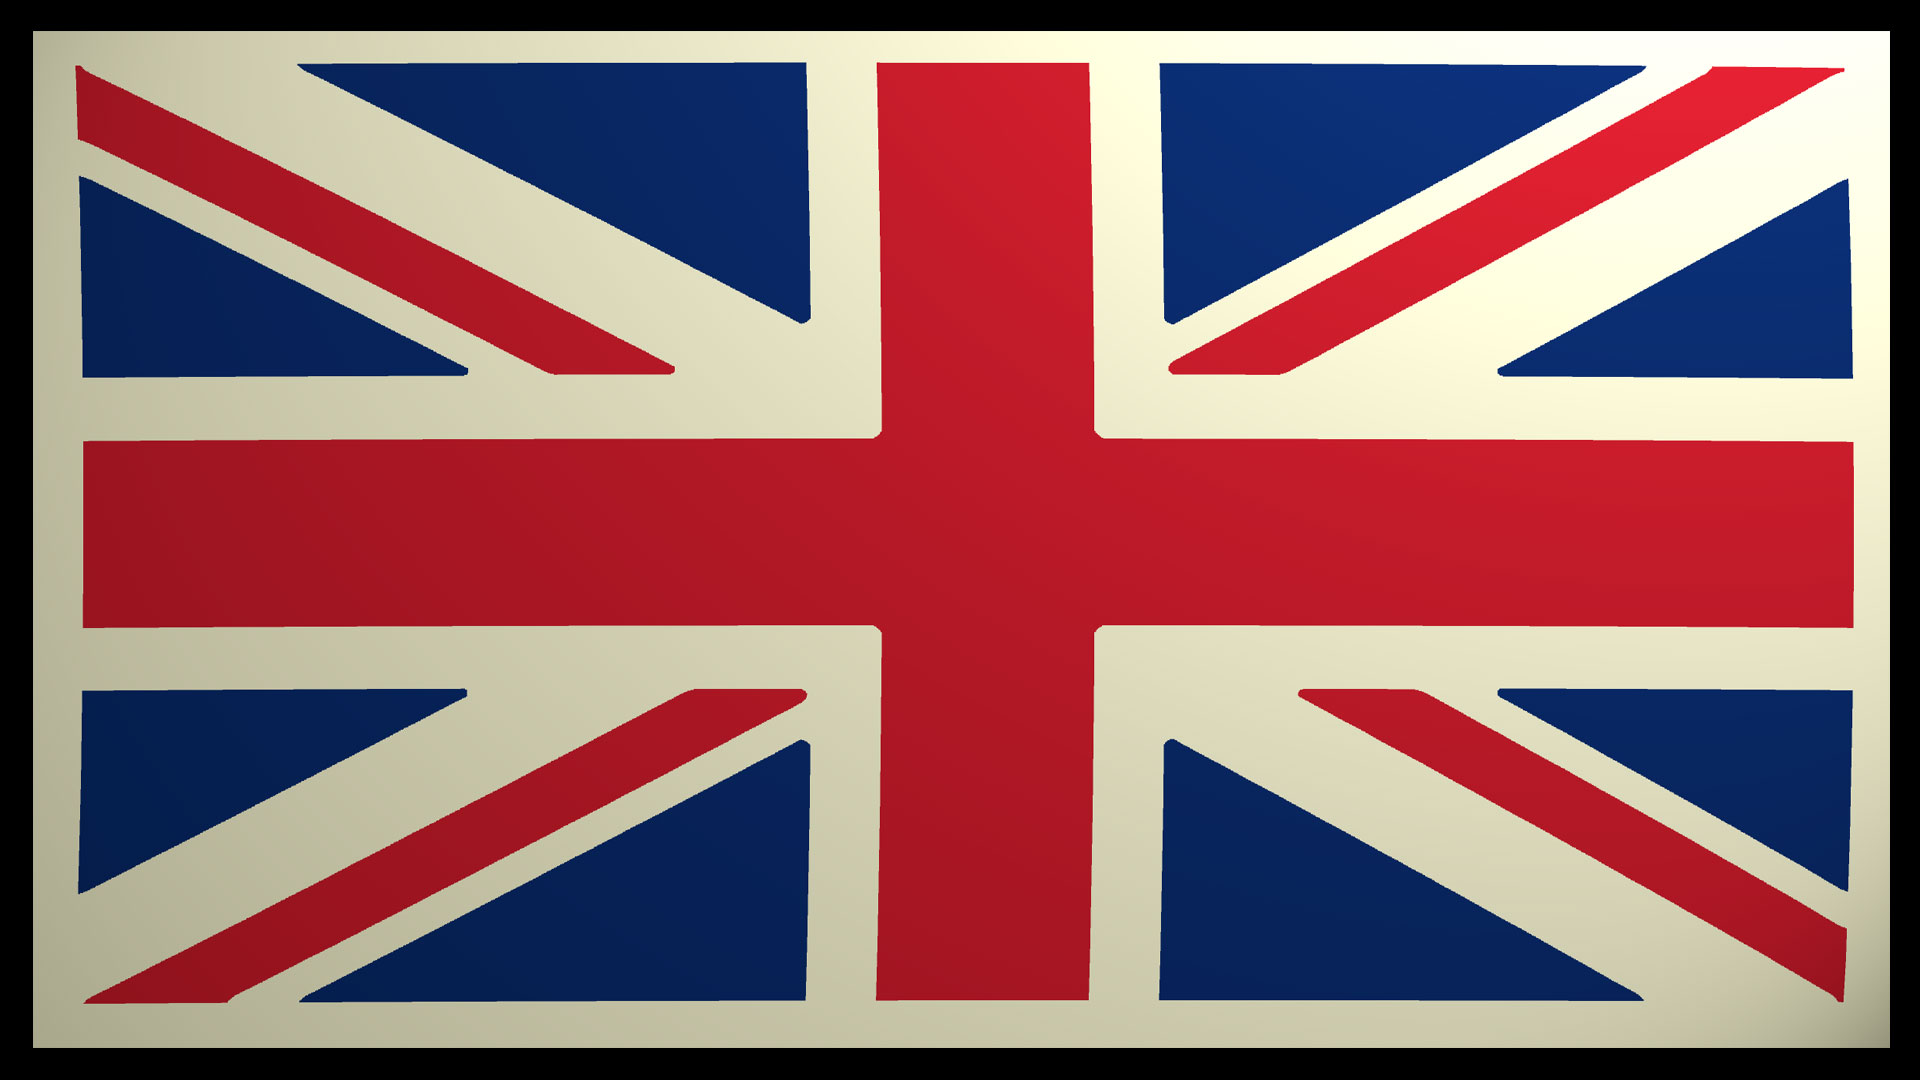 United Kingdom British Flag HD Wallpaper of Flag   hdwallpaper2013com 1920x1080